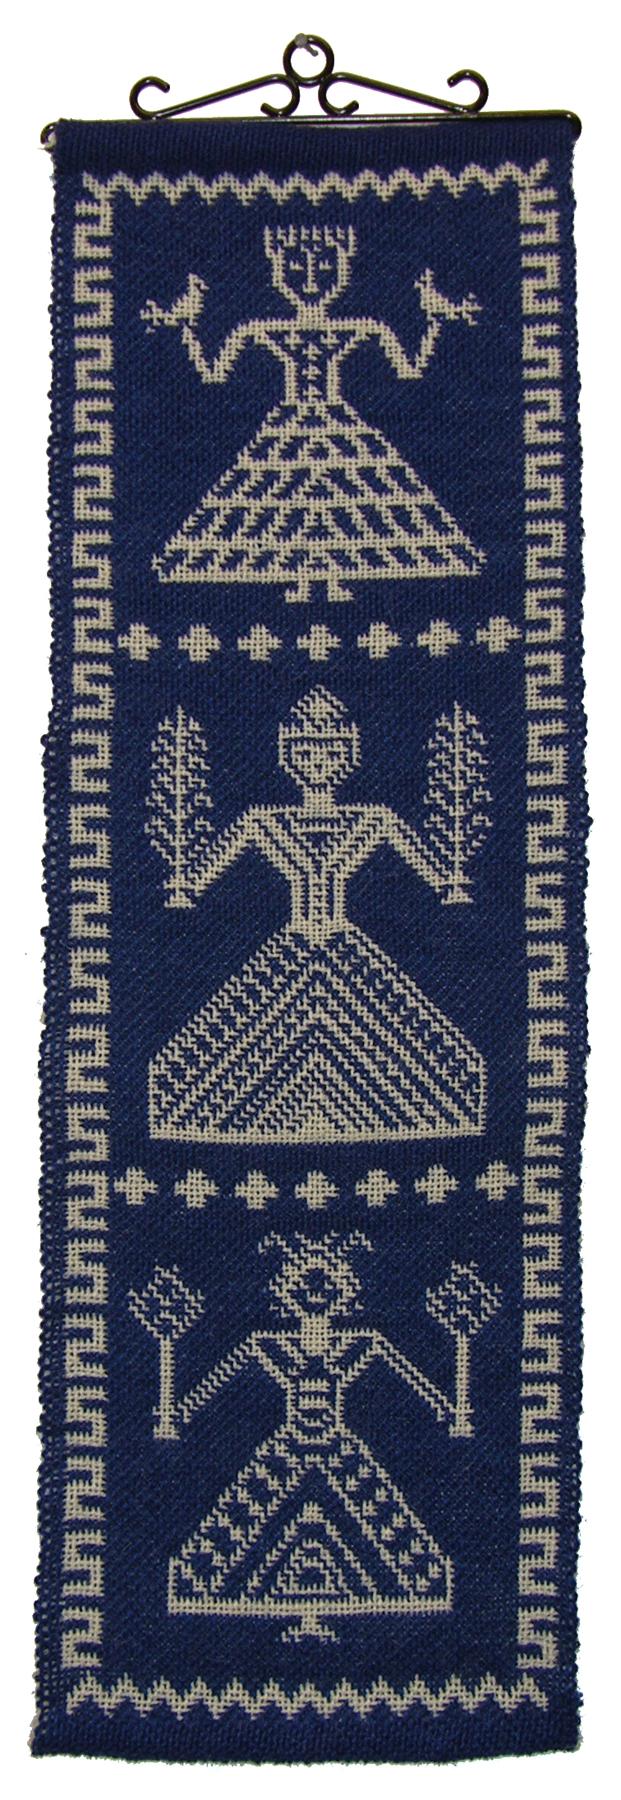 "Betty Rikansrud Nelson, Decorah, Iowa, ""Norse Goddesses"" wall hanging in double weave pickup, wool on wool, 2009."